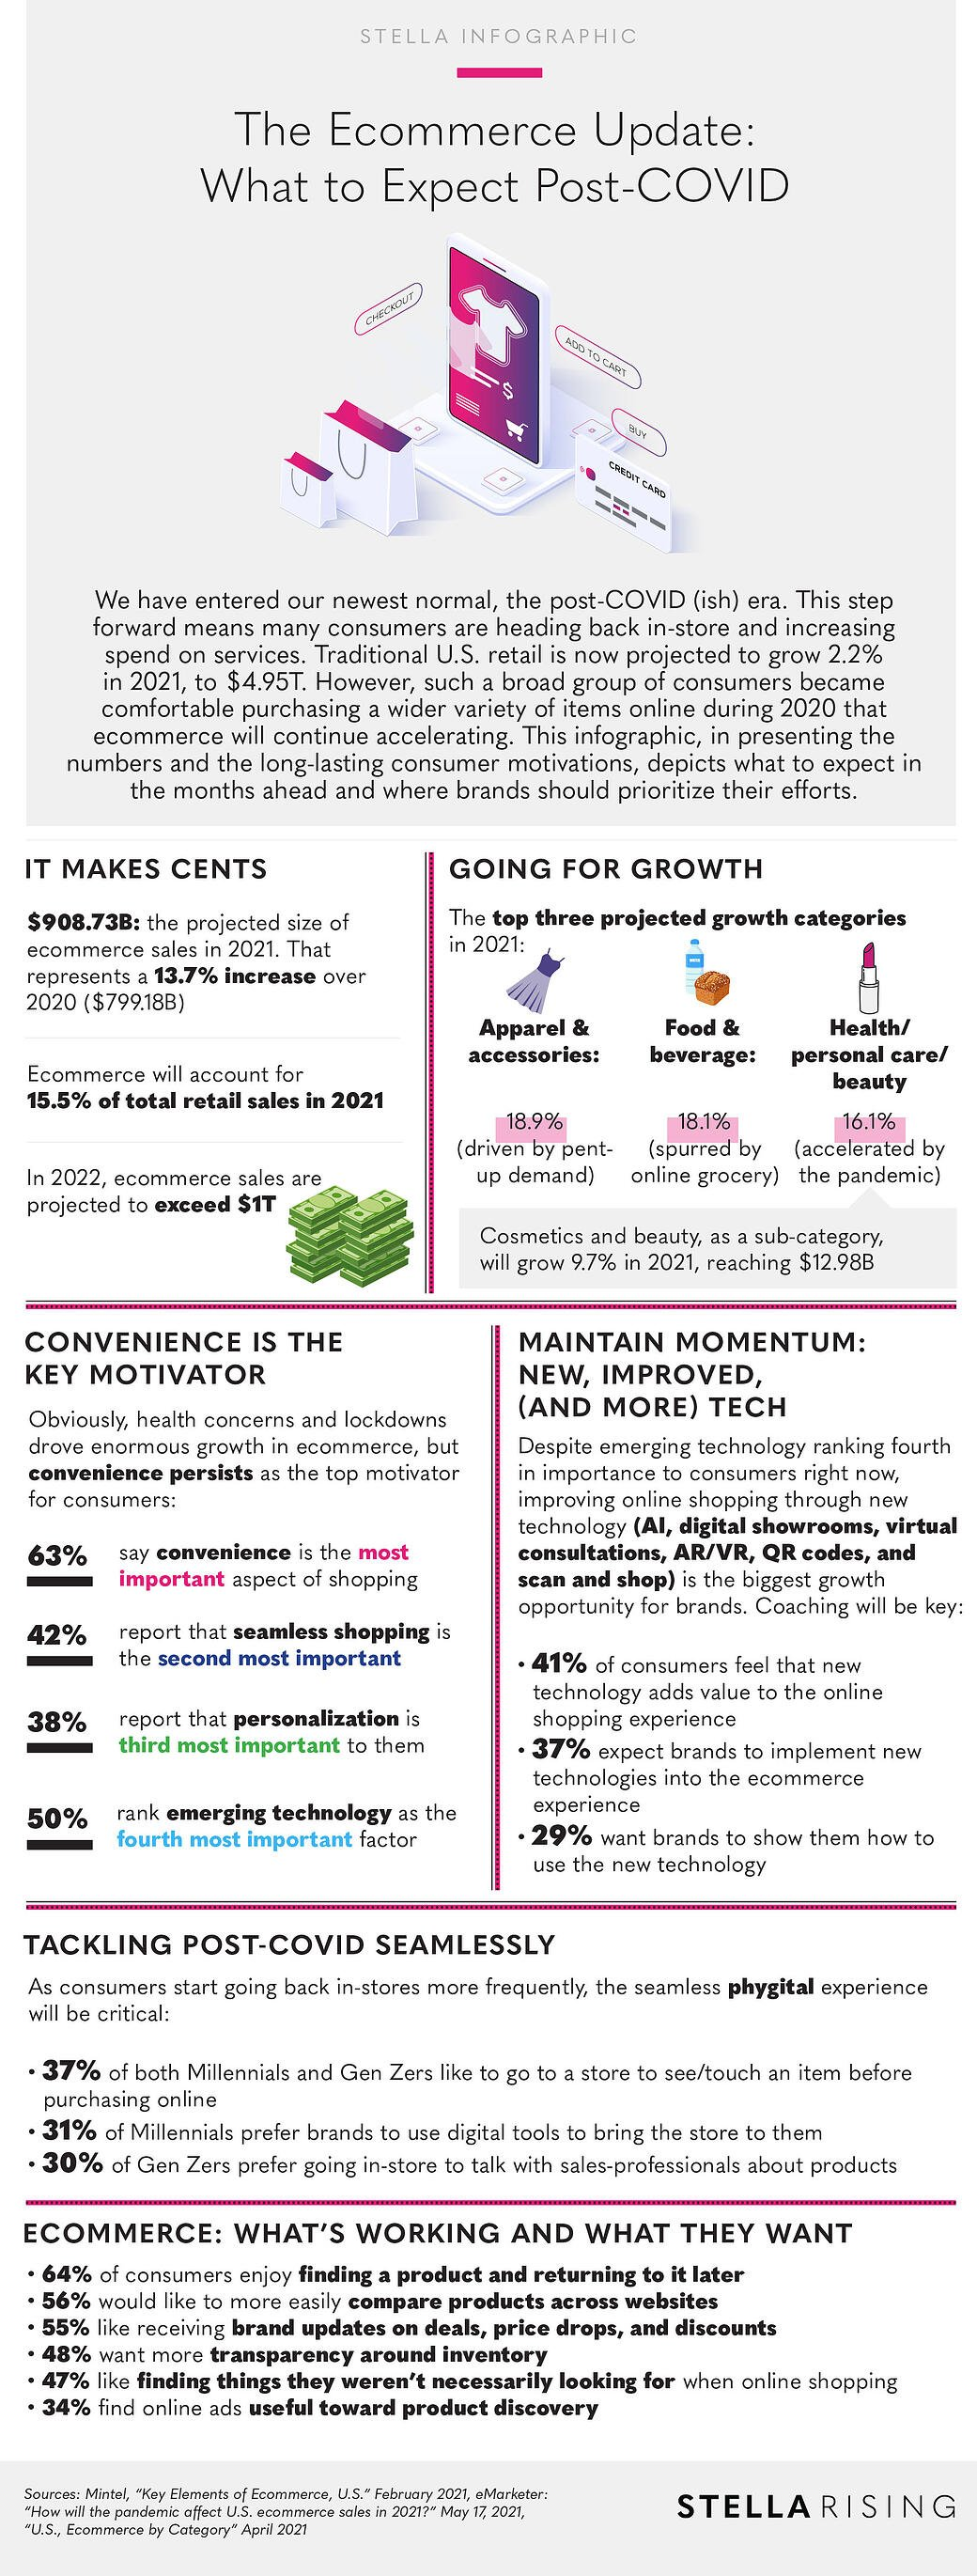 EcommerceUpdate_Infographic